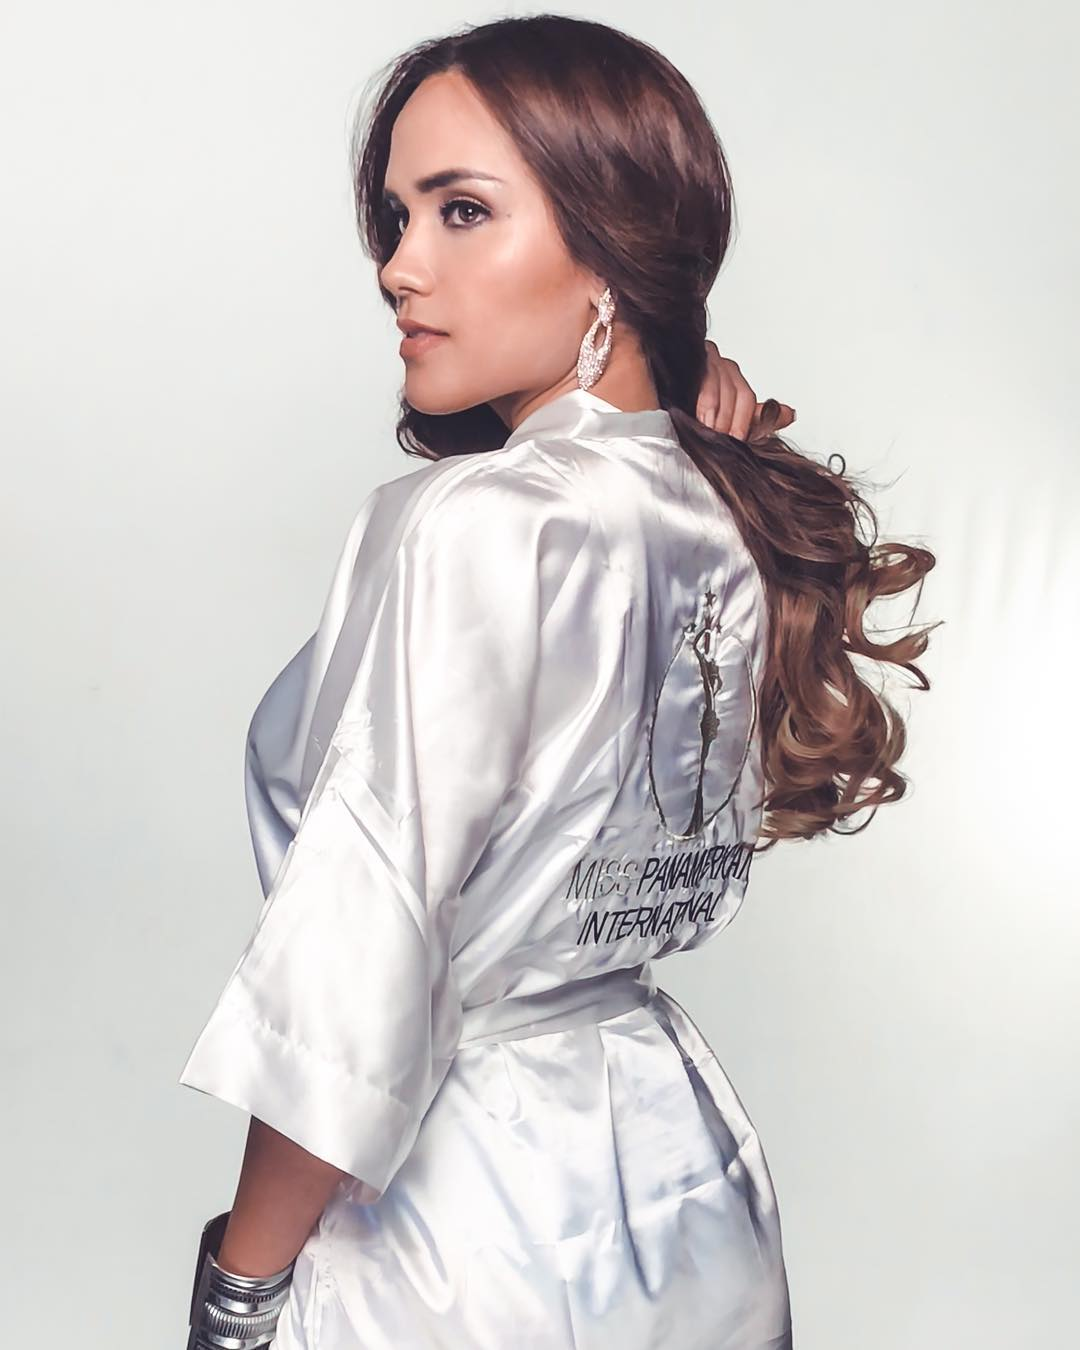 estefani mauricci, segunda finalista de miss panamerican international 2018. - Página 3 42834110